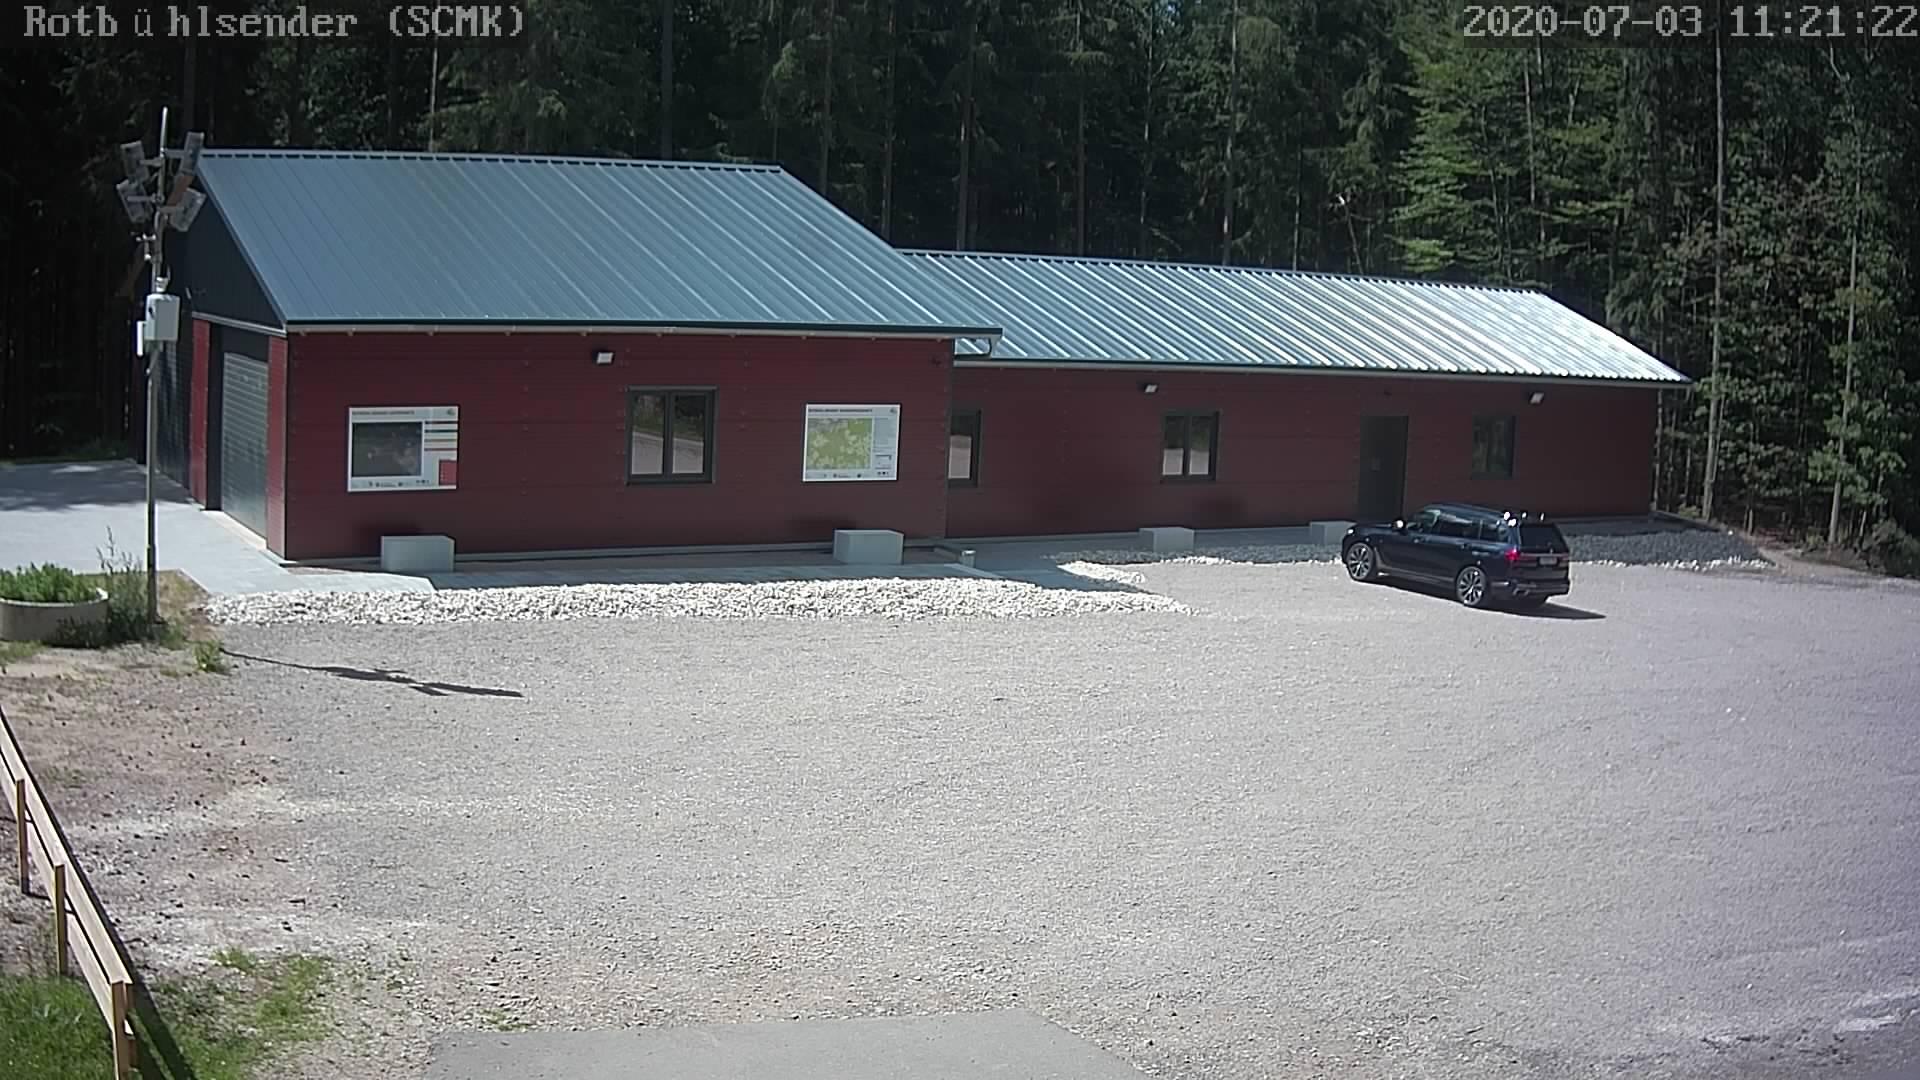 Hirschau Rotbühl Webcam